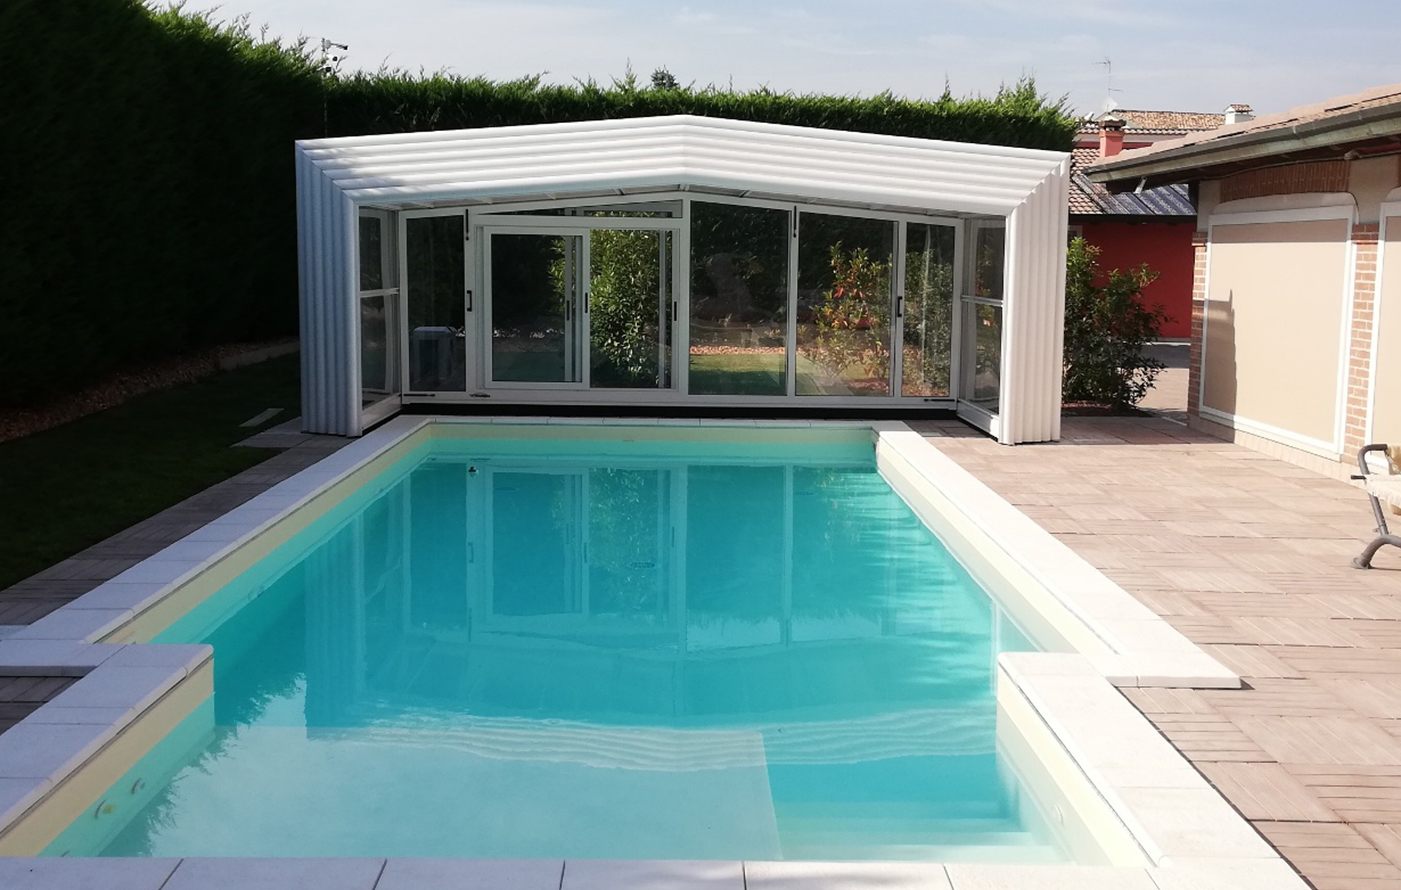 agriverde-copertura-telescopica-piscina-01